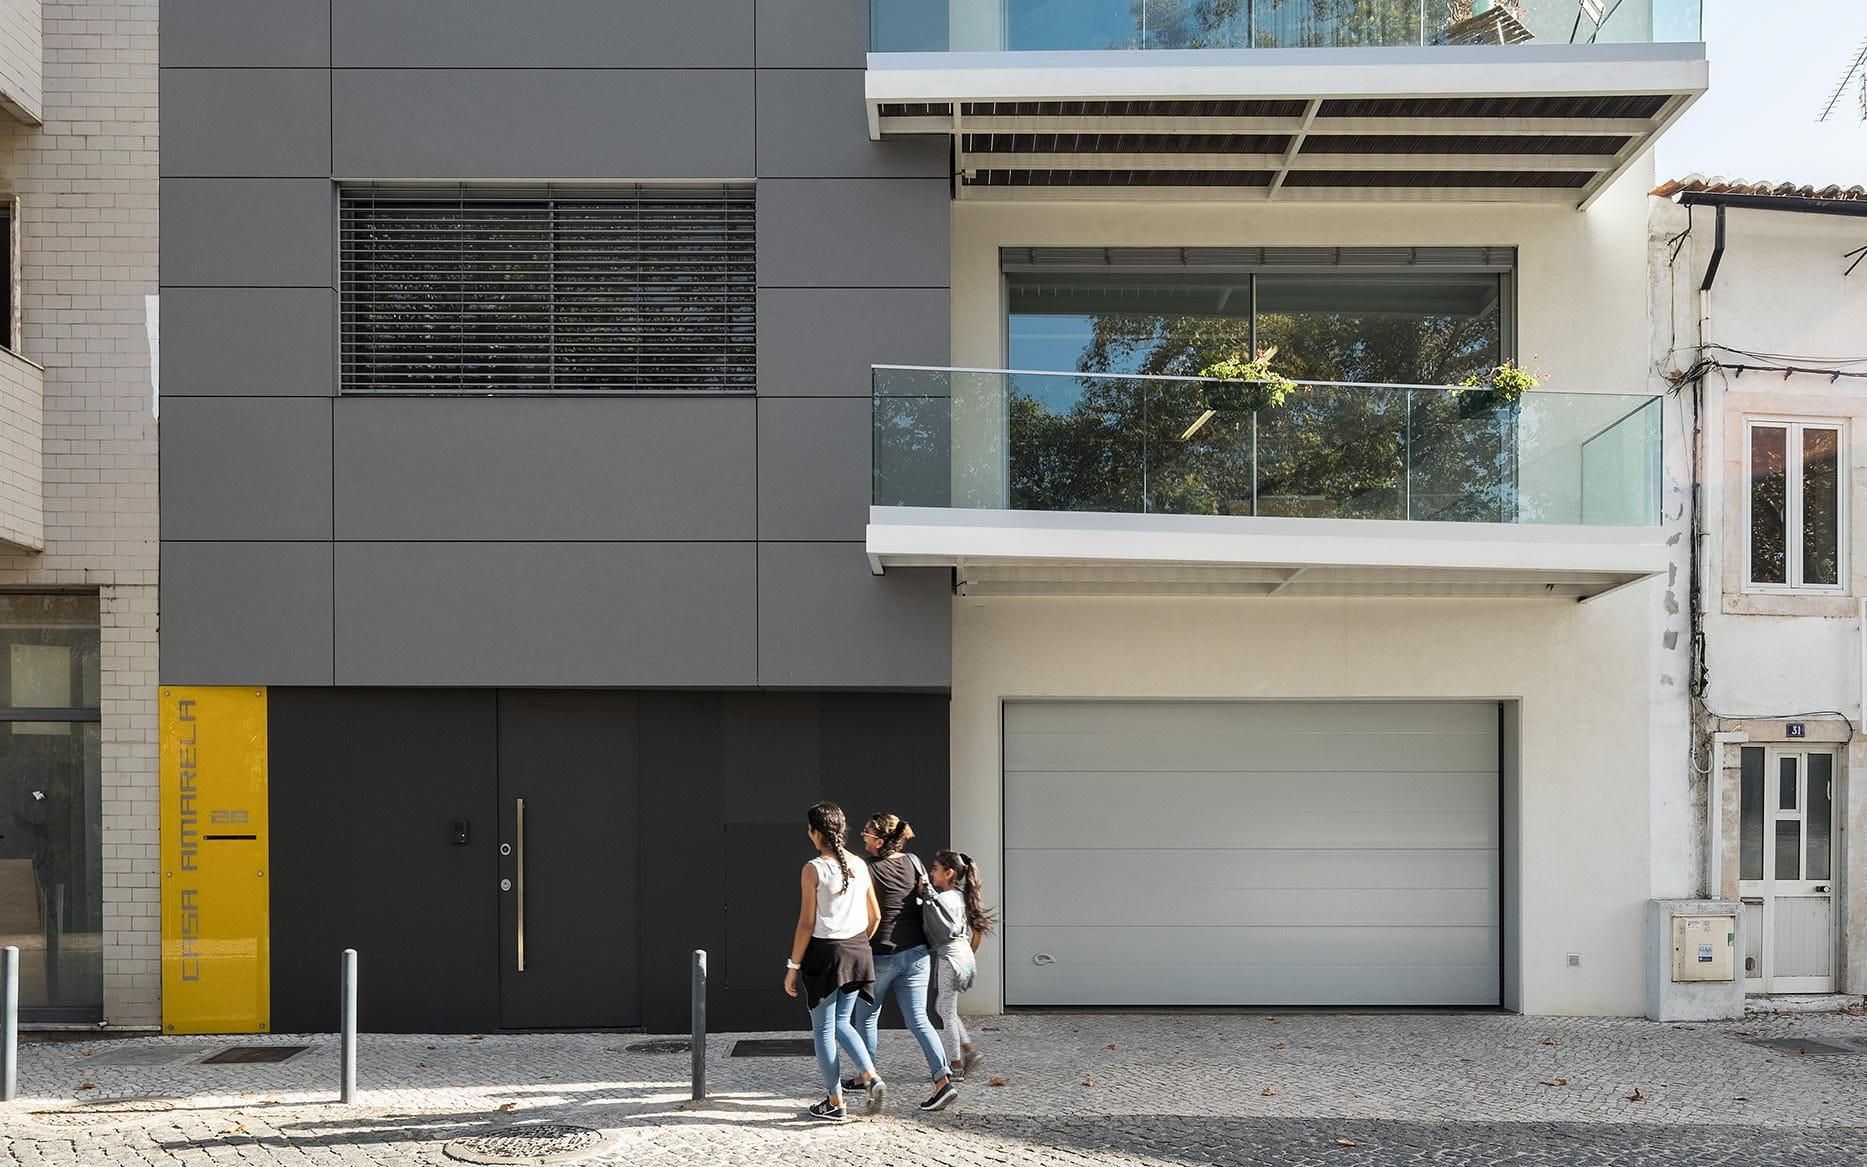 Edifício Casa Amarela